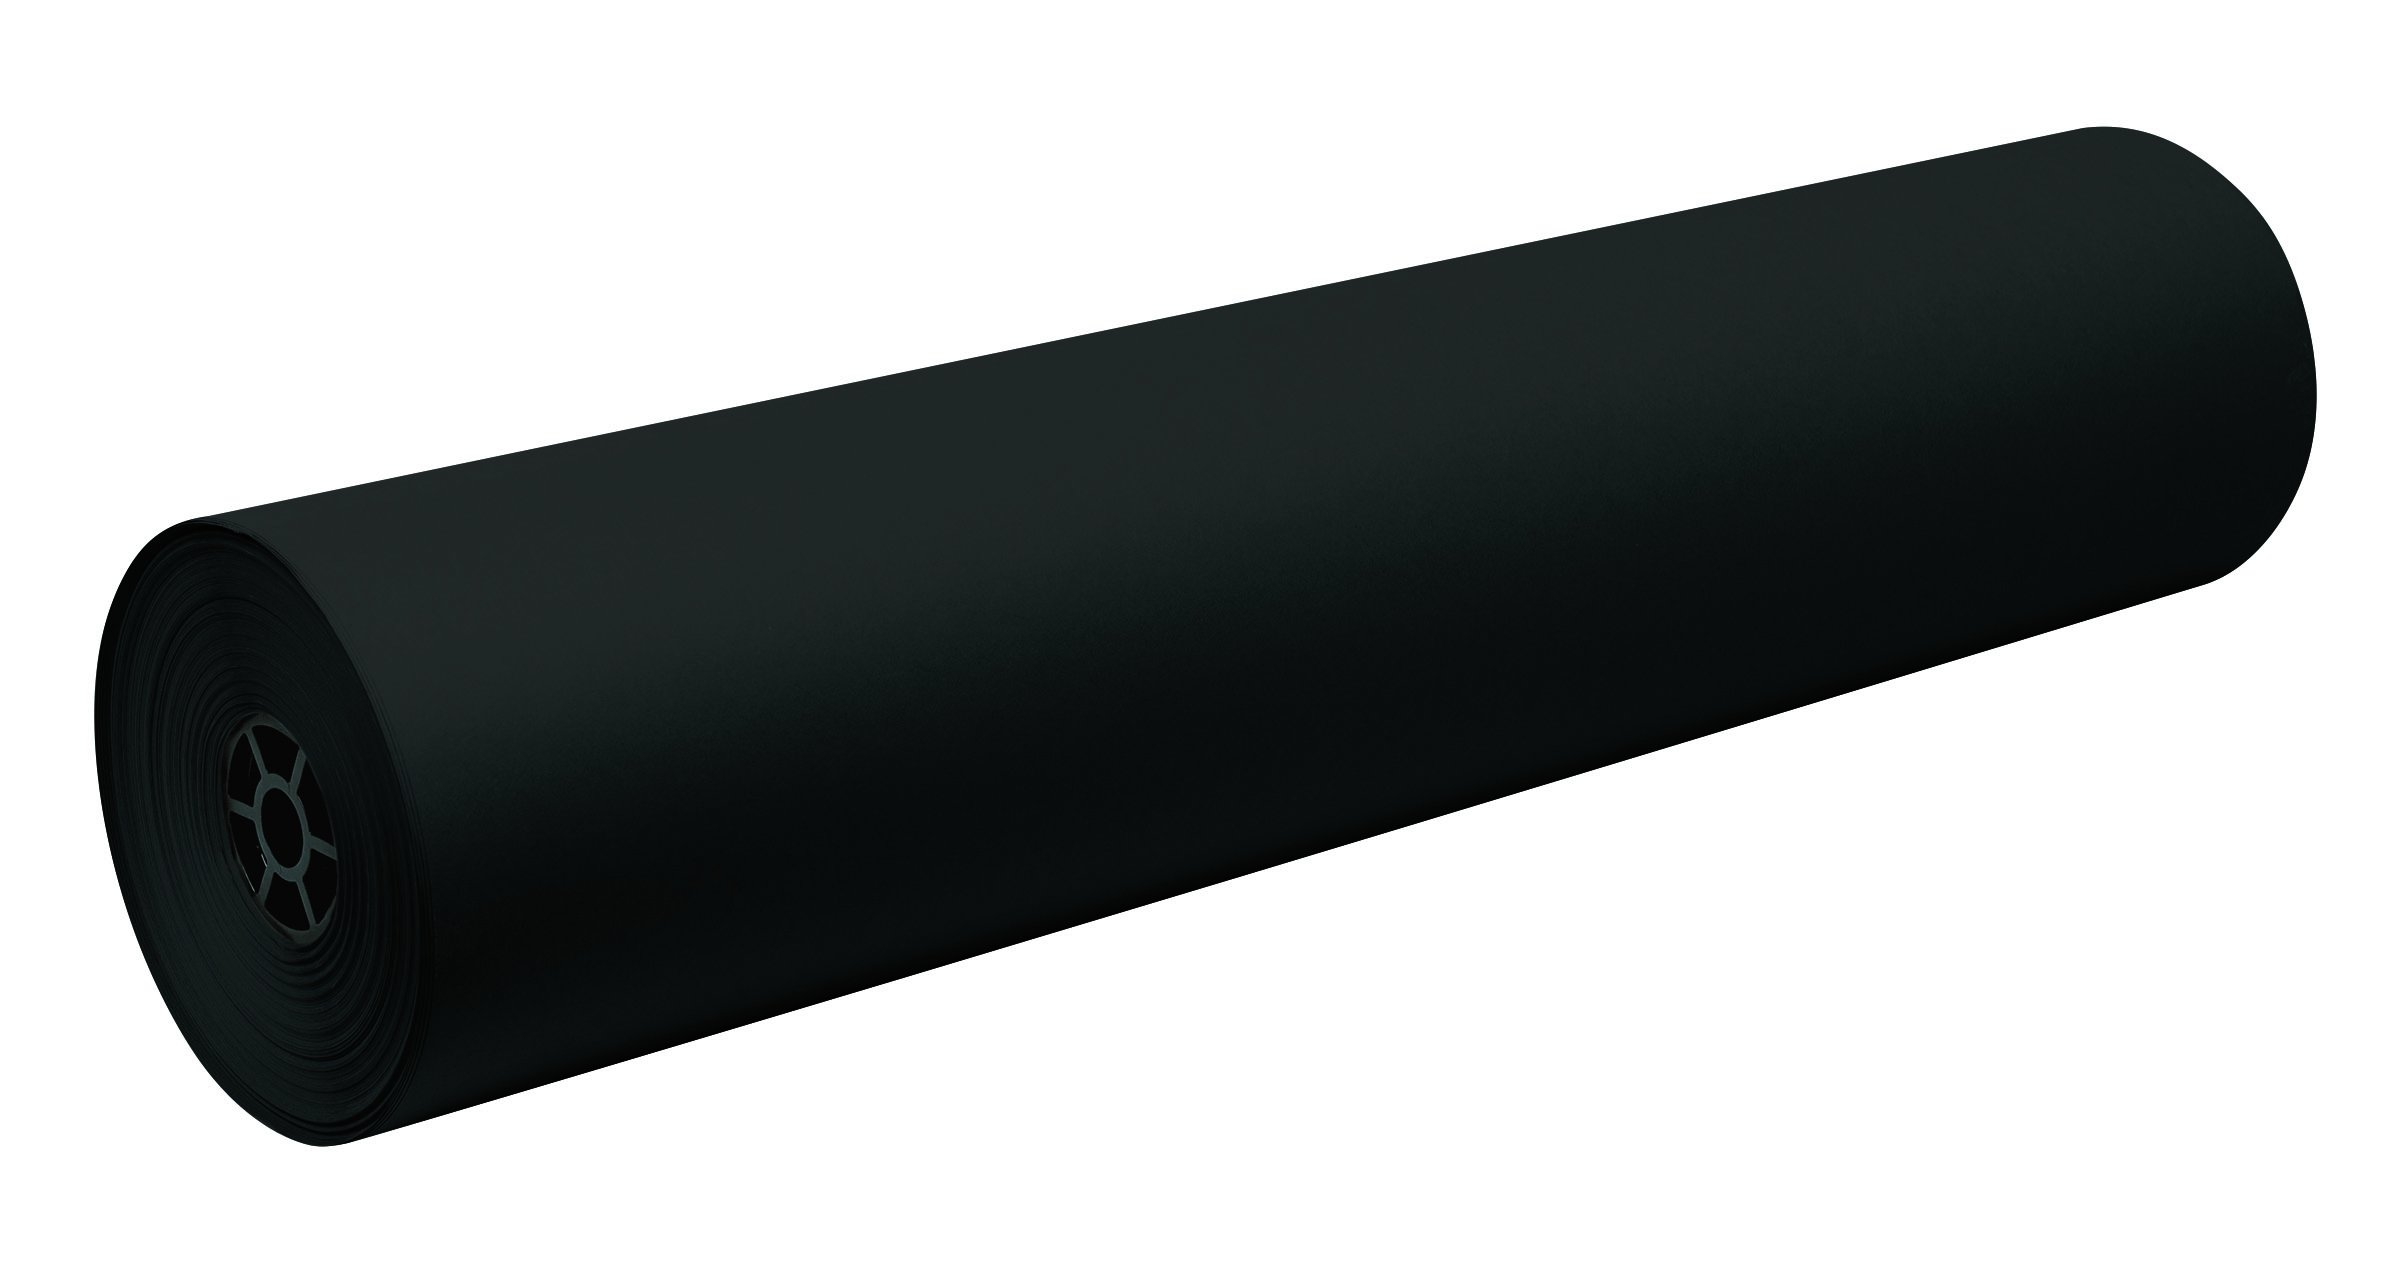 Pacon Decorol Art Paper Roll, 3-Feet by 500-Feet, Black (100600)